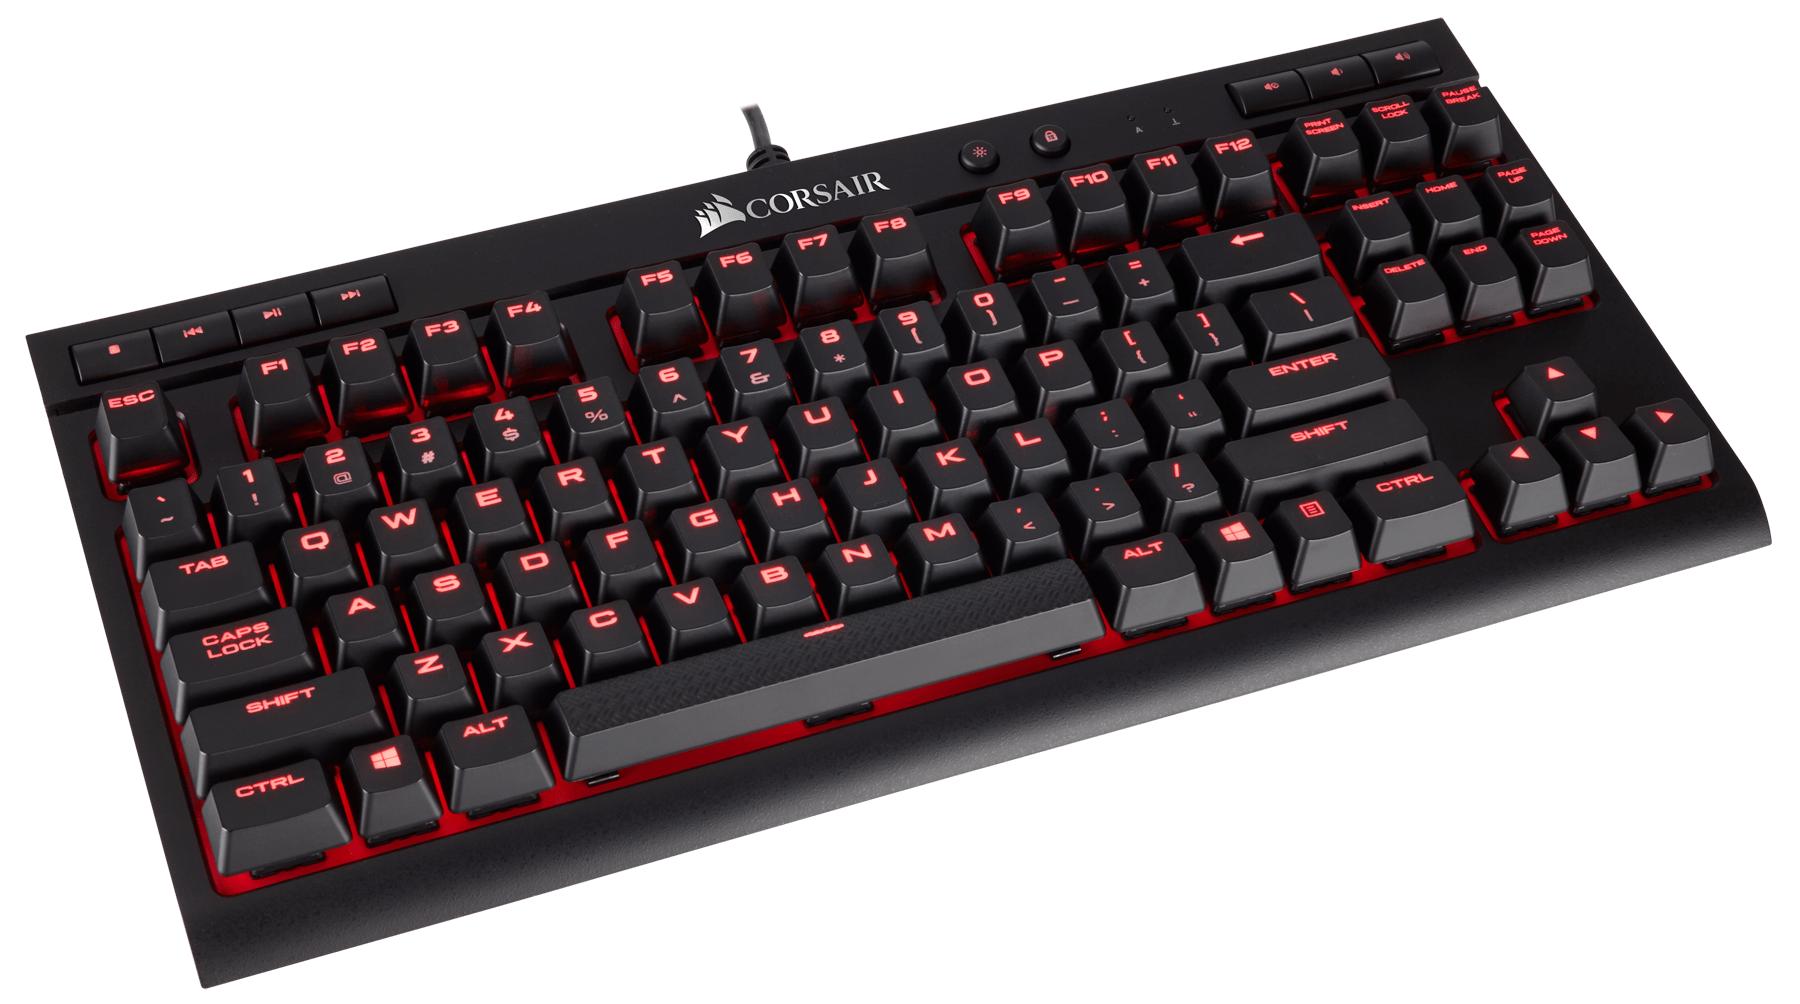 corsair, gaming, mechanical keyboard, corsair k63